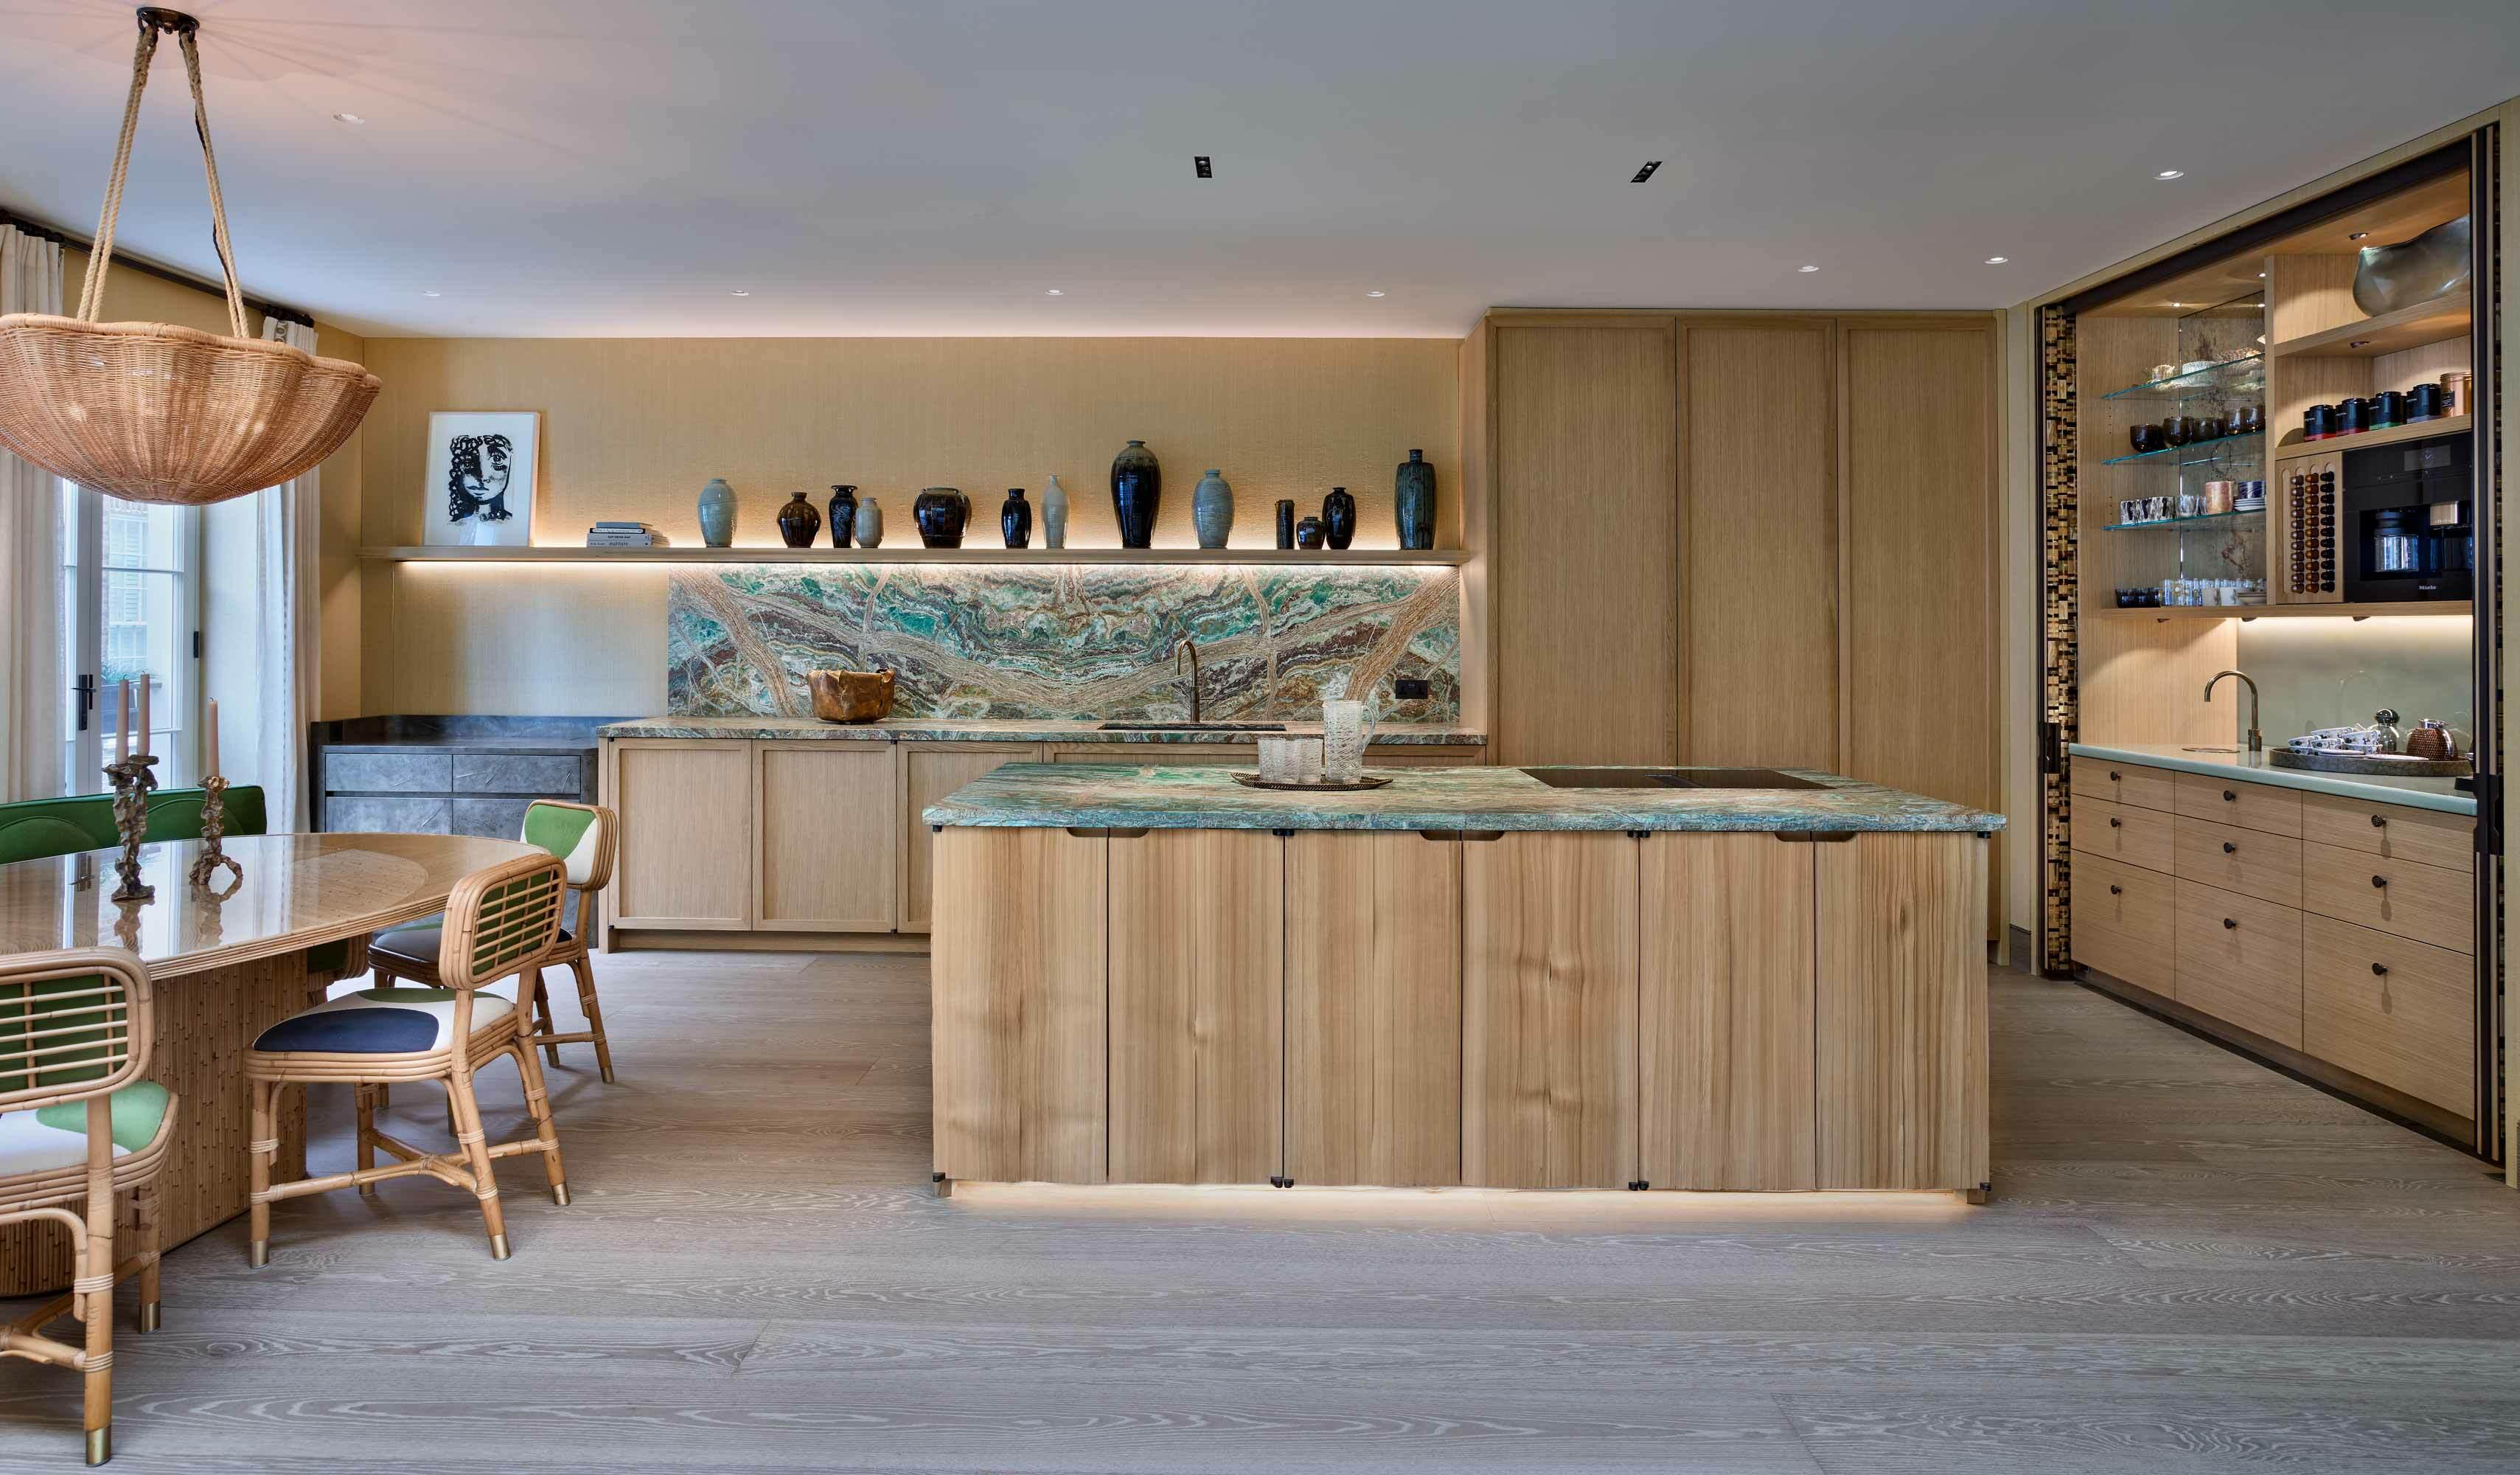 Kitchens_28.jpg